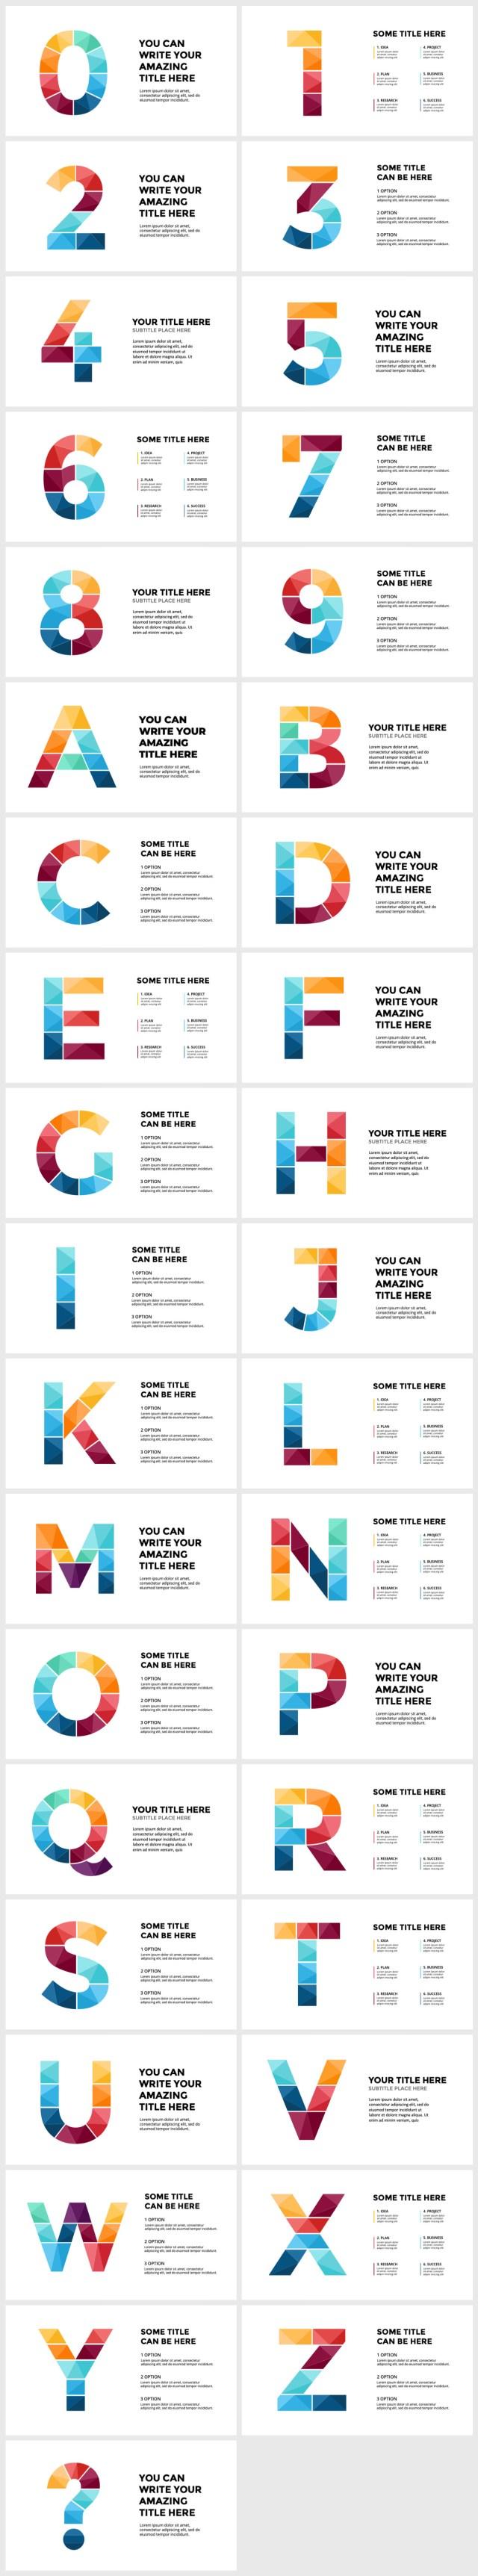 Huge Infographics Bundle! Lifetime Updates! PowerPoint, Photoshop, Illustrator. - 225